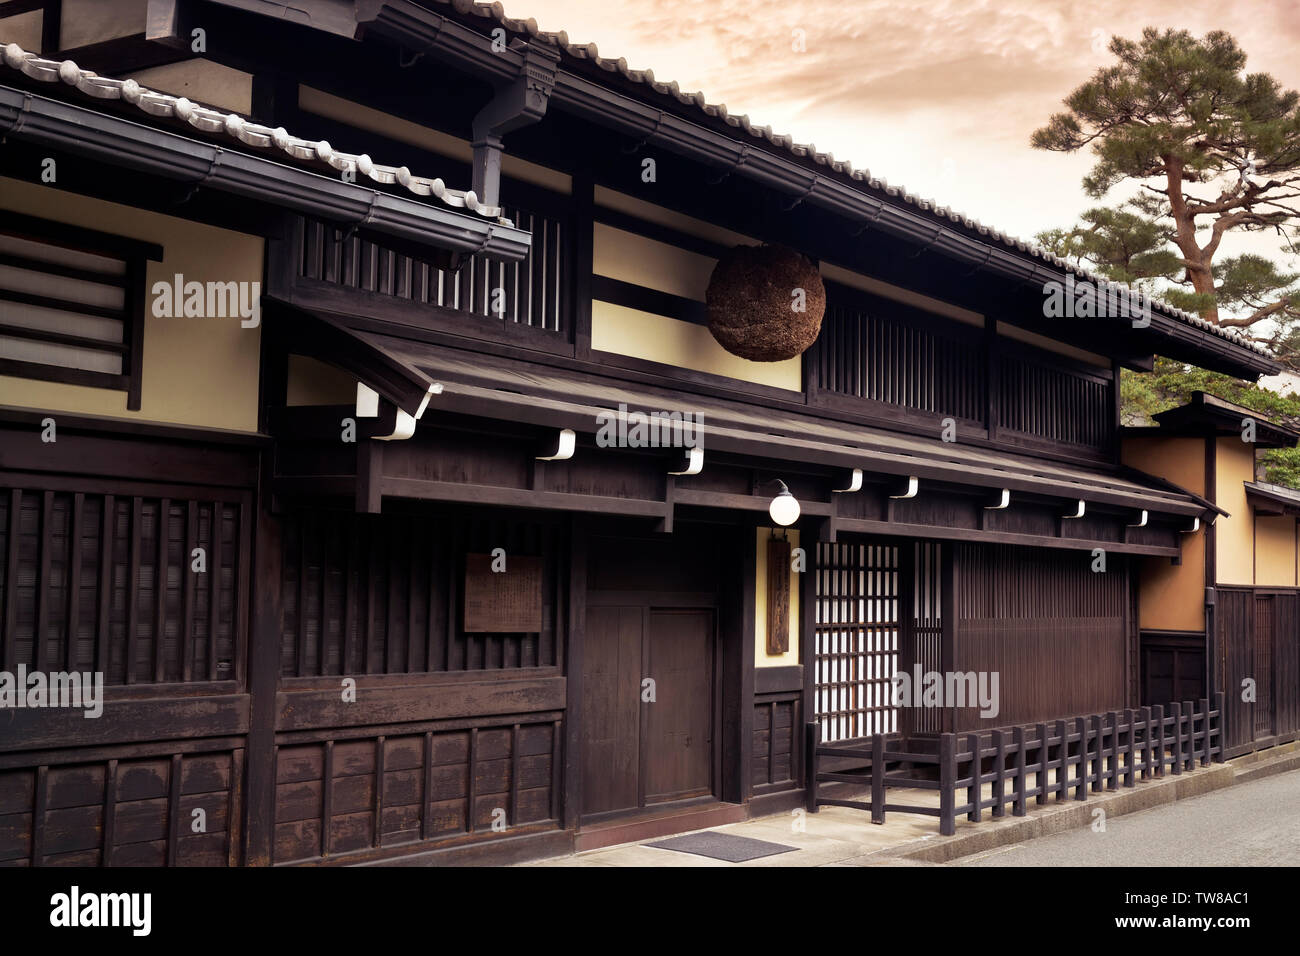 Sake brewery in Takayama old town with a Sugidama, cedar ball, hanging above the entrance. Japan travel photography, Takayama, Gifu prefecture, 2018. - Stock Image